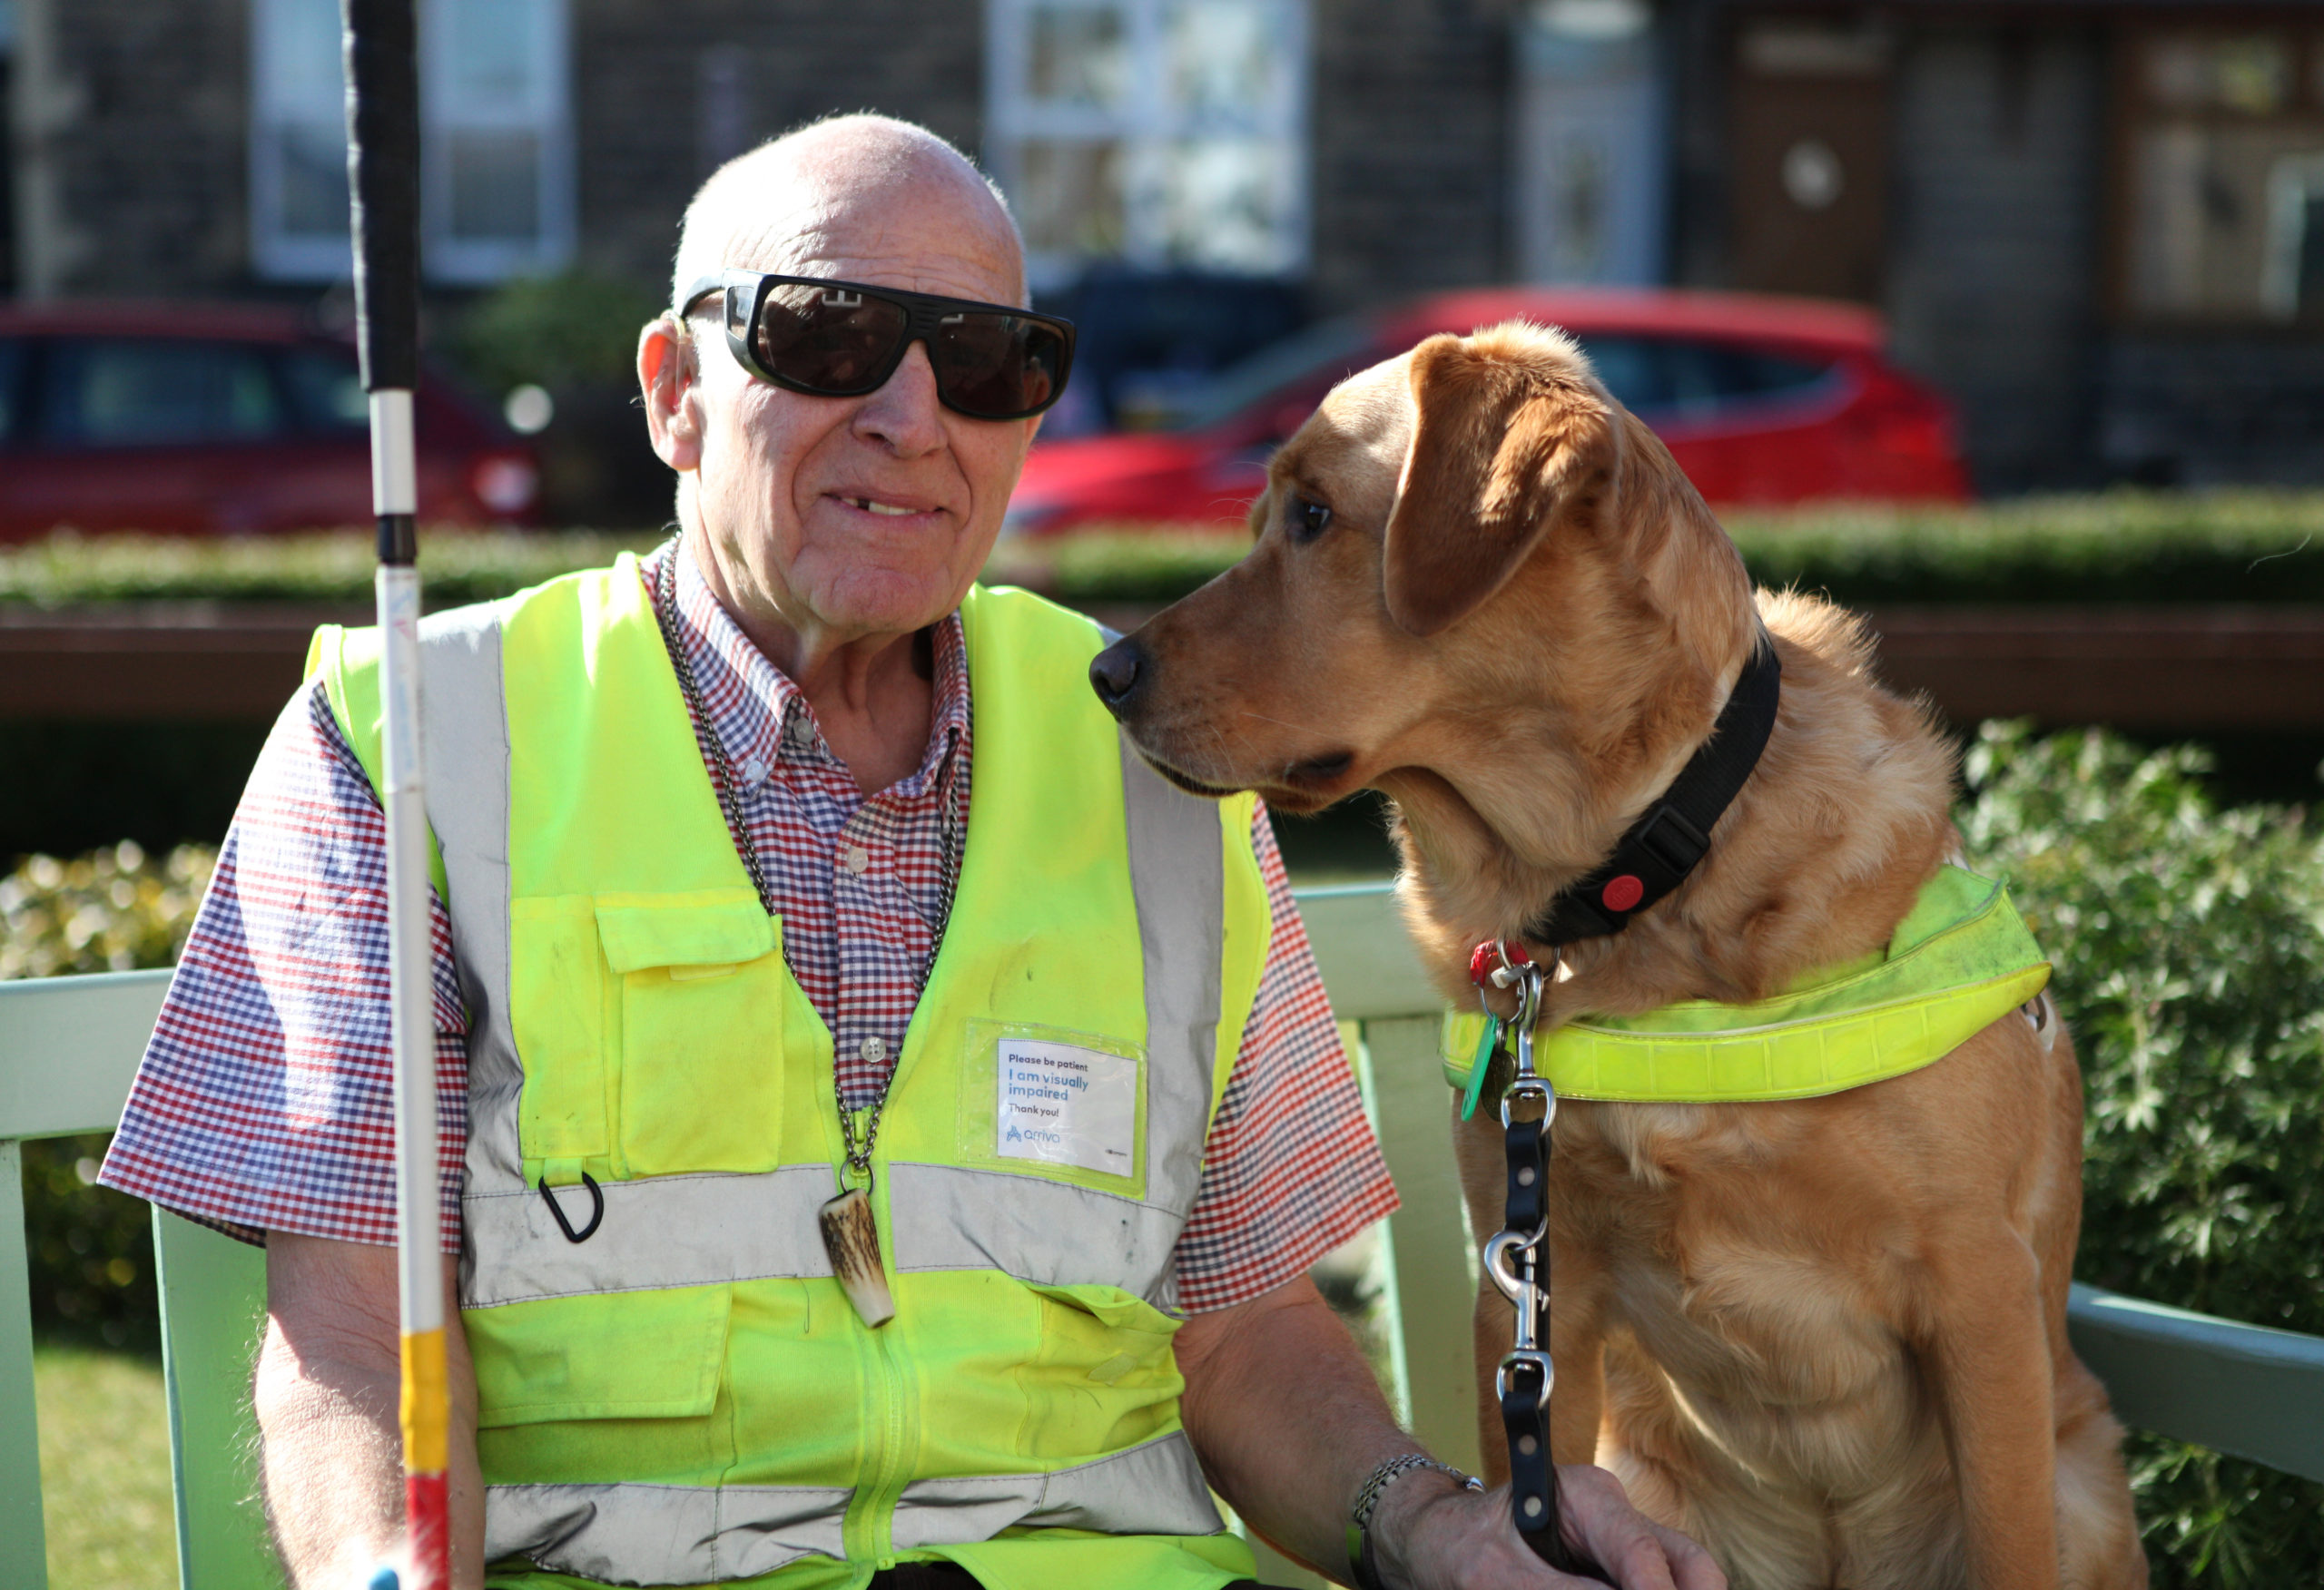 Doug with his guide dog Albert